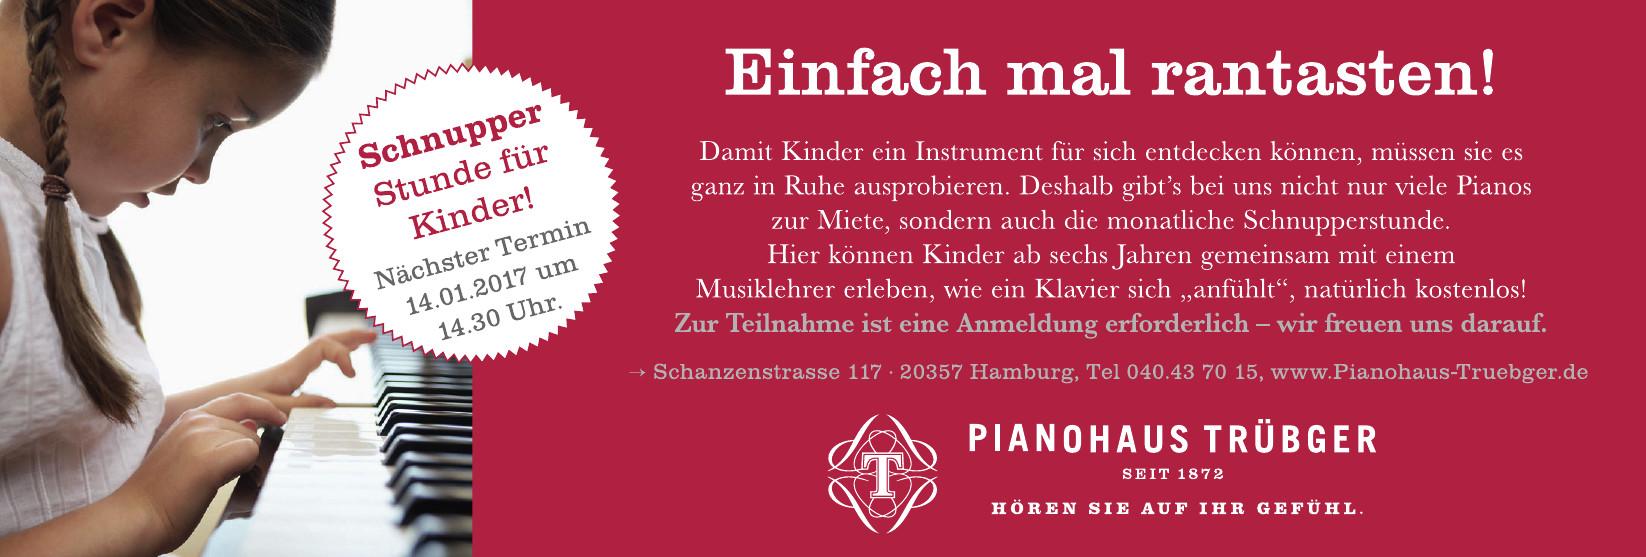 Pianohaus Truebger